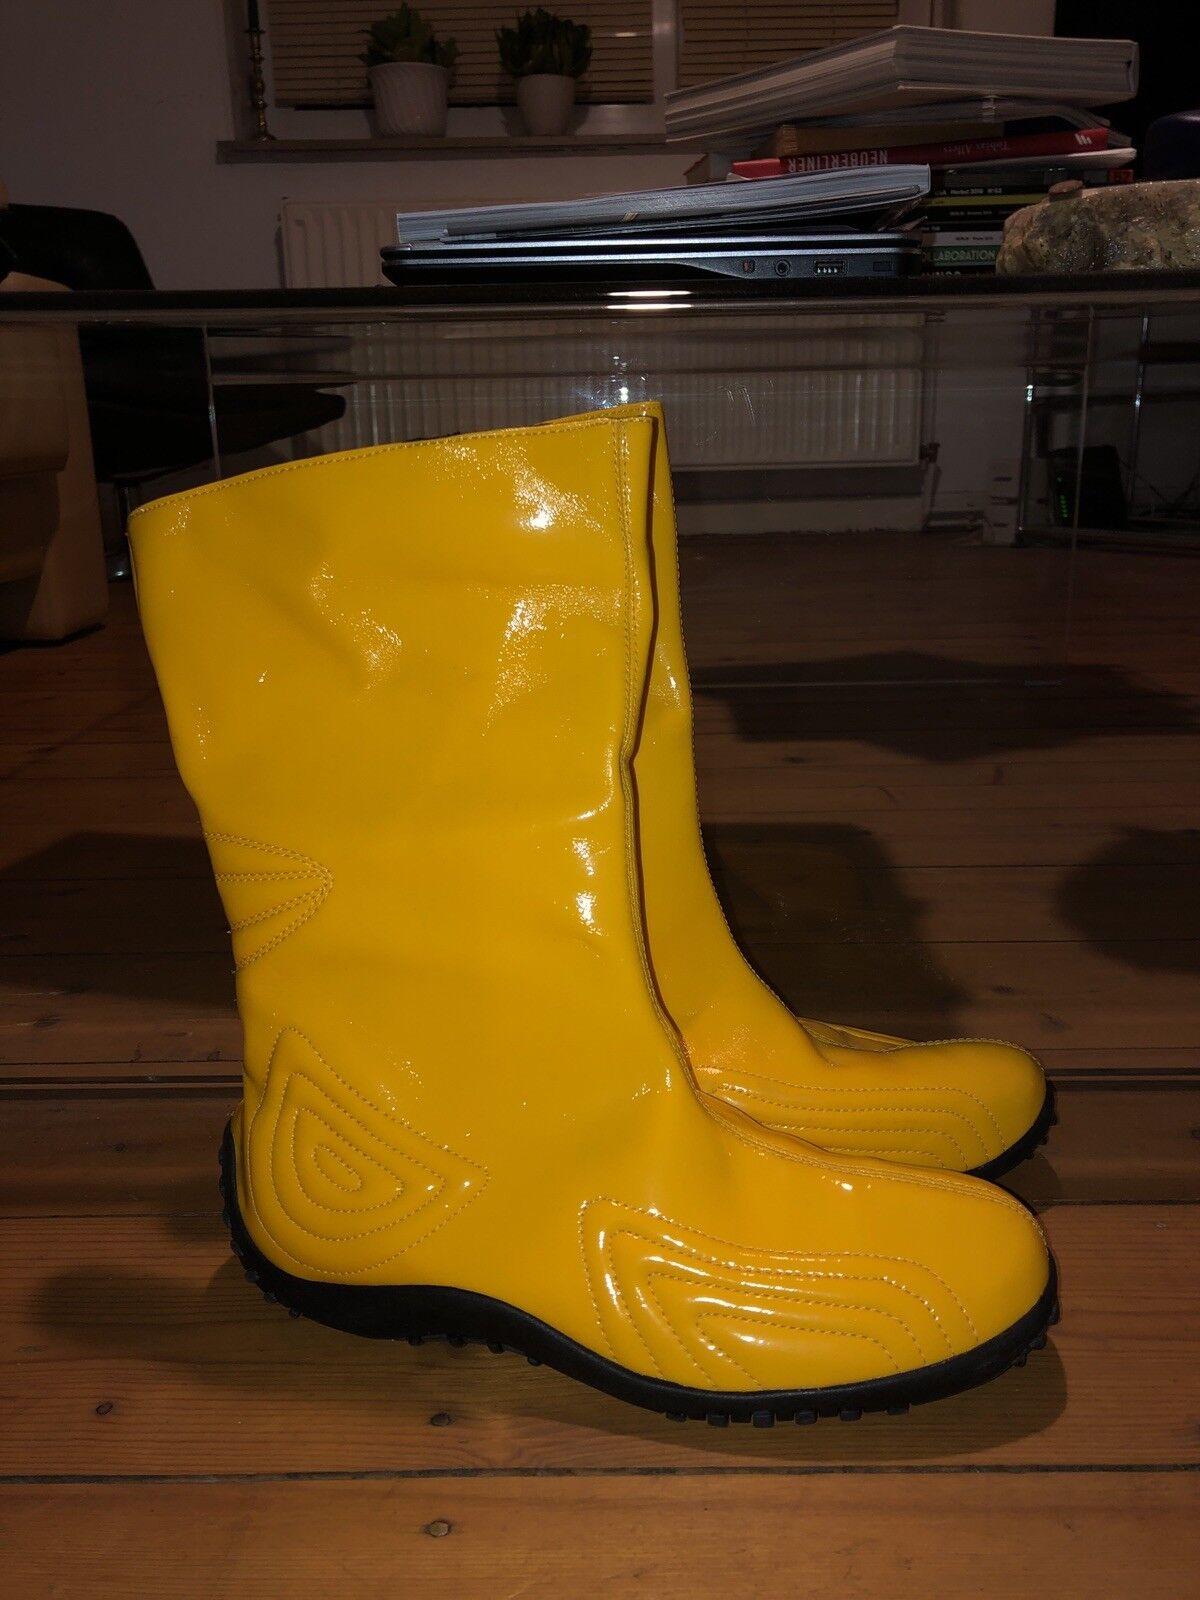 Romika botas de goma laca amarillo vintage 90er talla. 40 rara vez top estado ungetragen